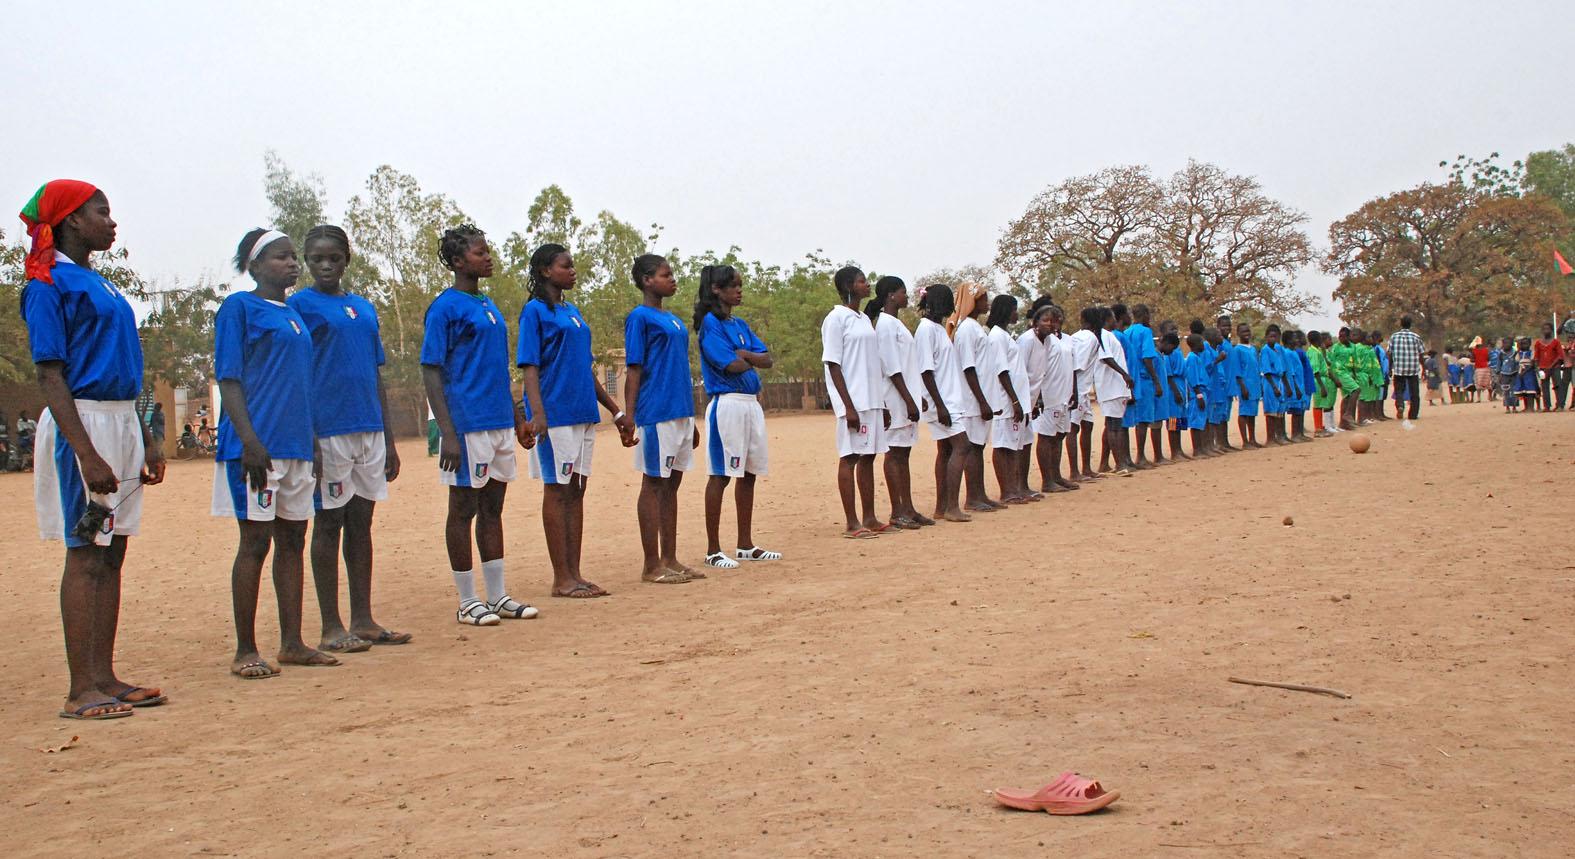 Frauenfußball in Kamerun (c) Walter Korn